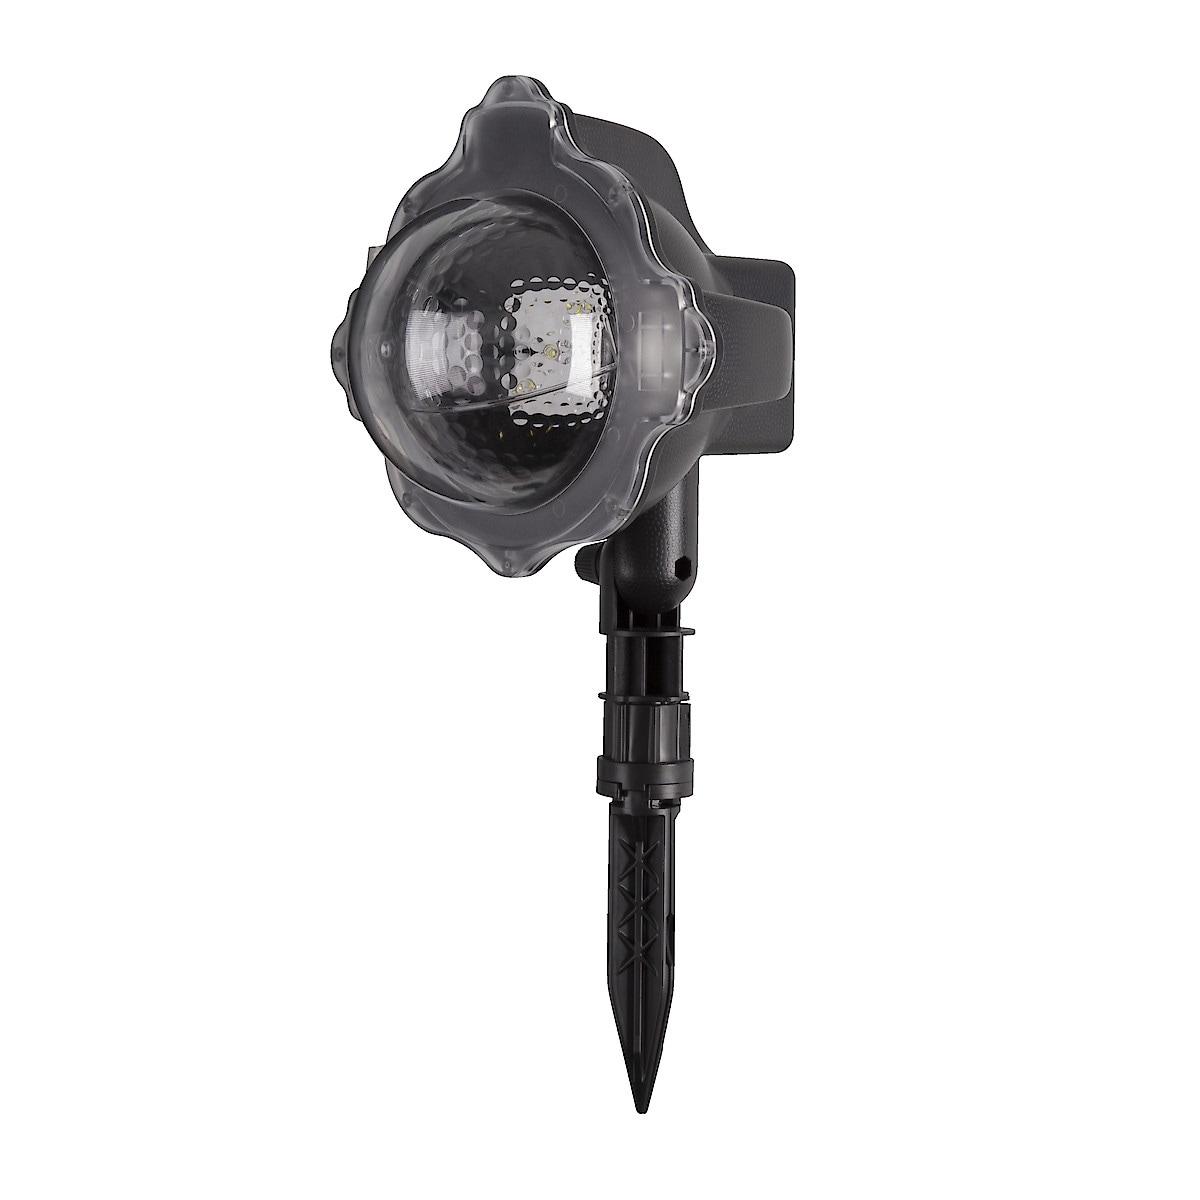 LED-projektori lumisade